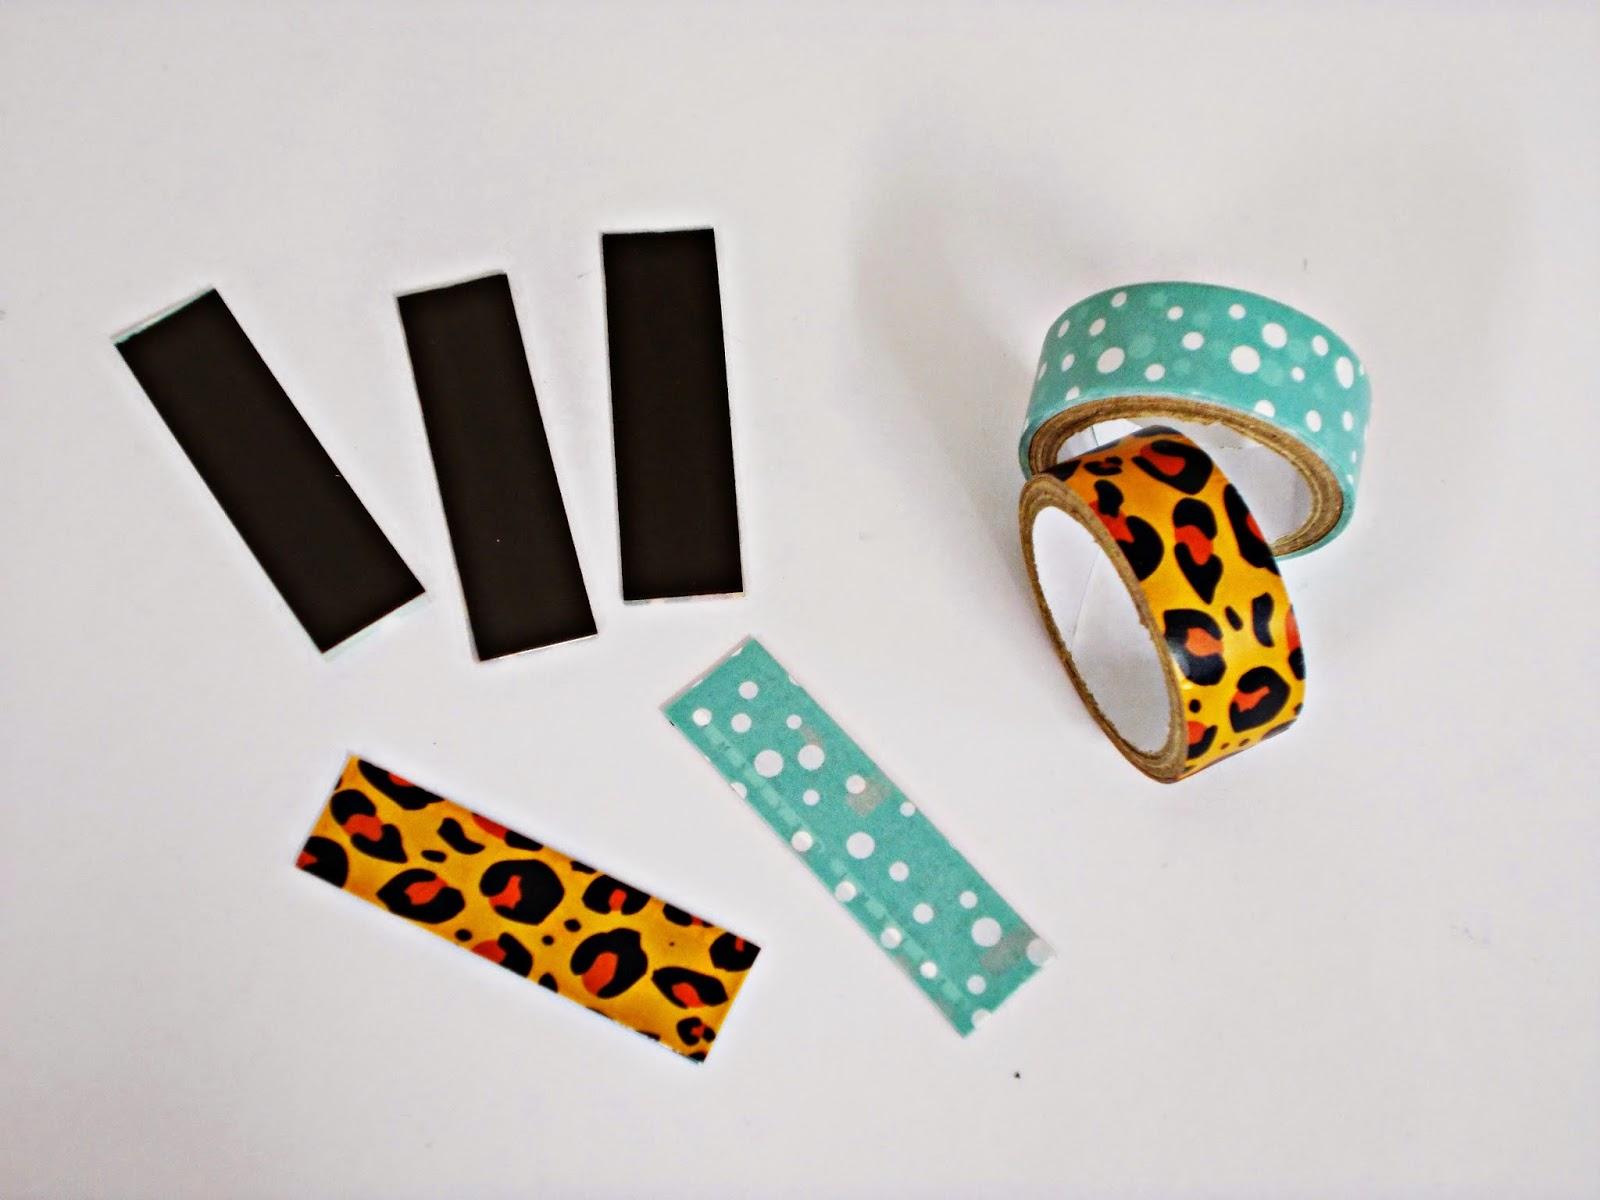 DIY-reciclar-imames-nevera-washi tape-4